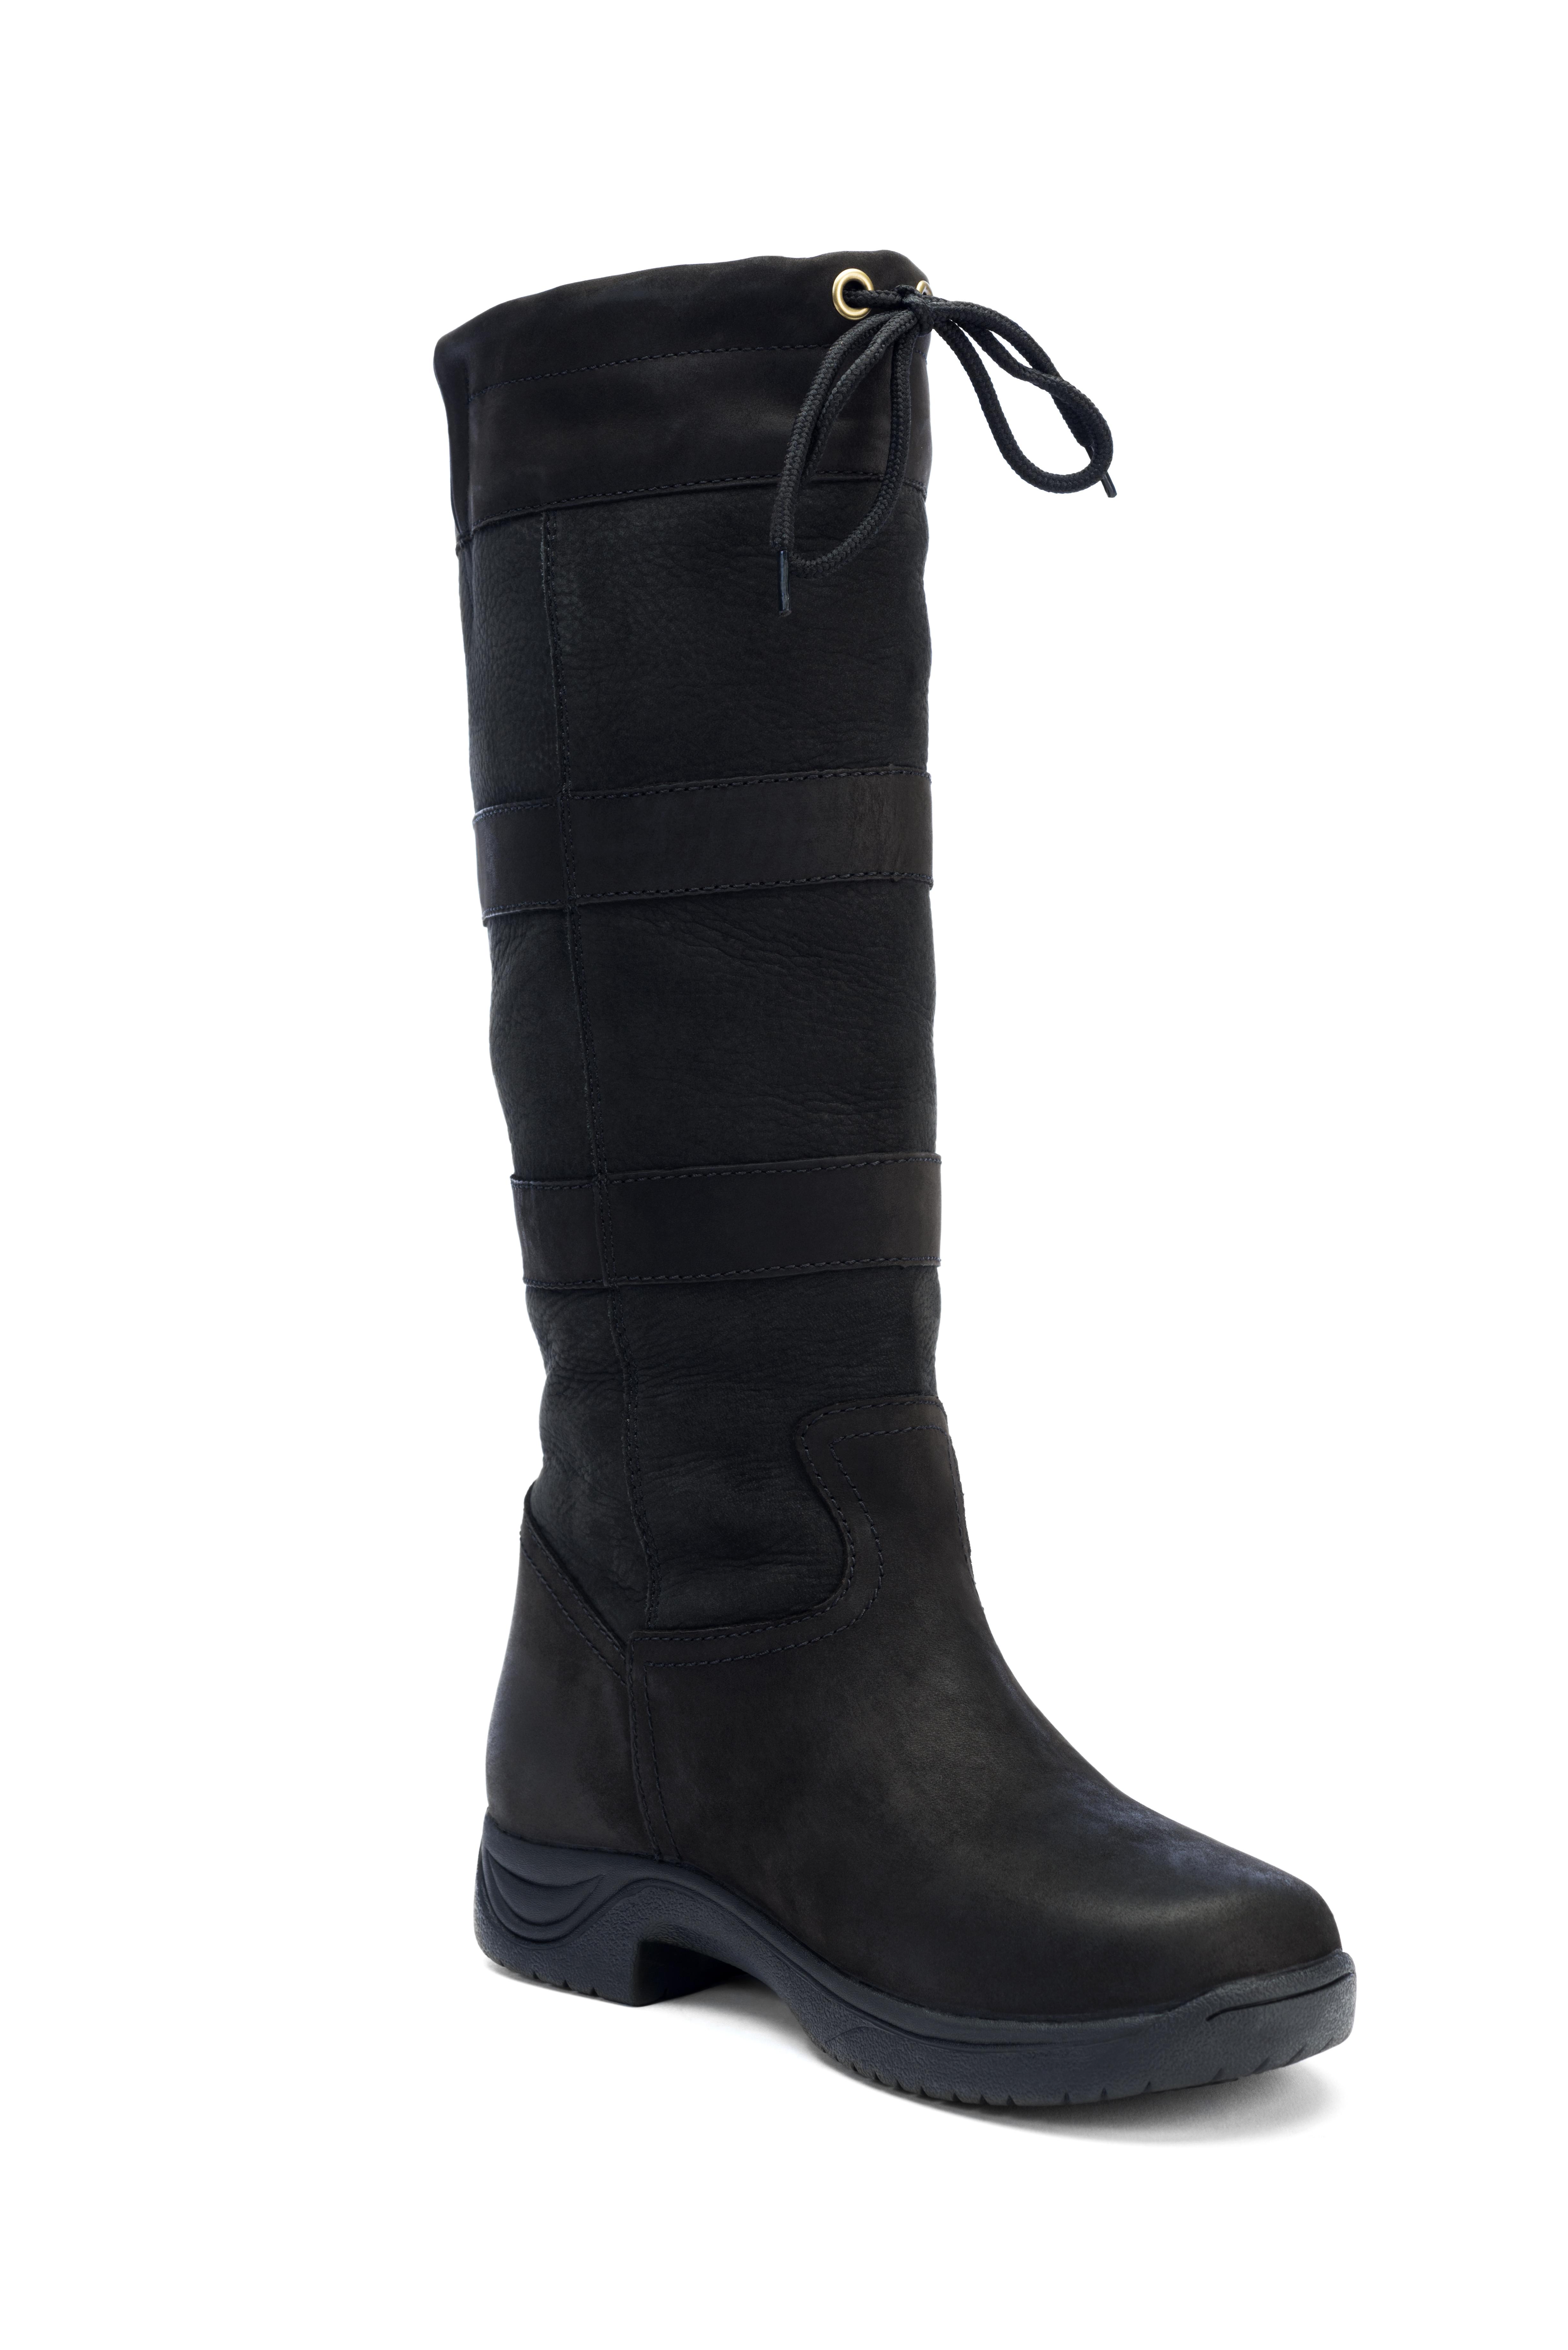 dublin river boots black 8 5 ebay